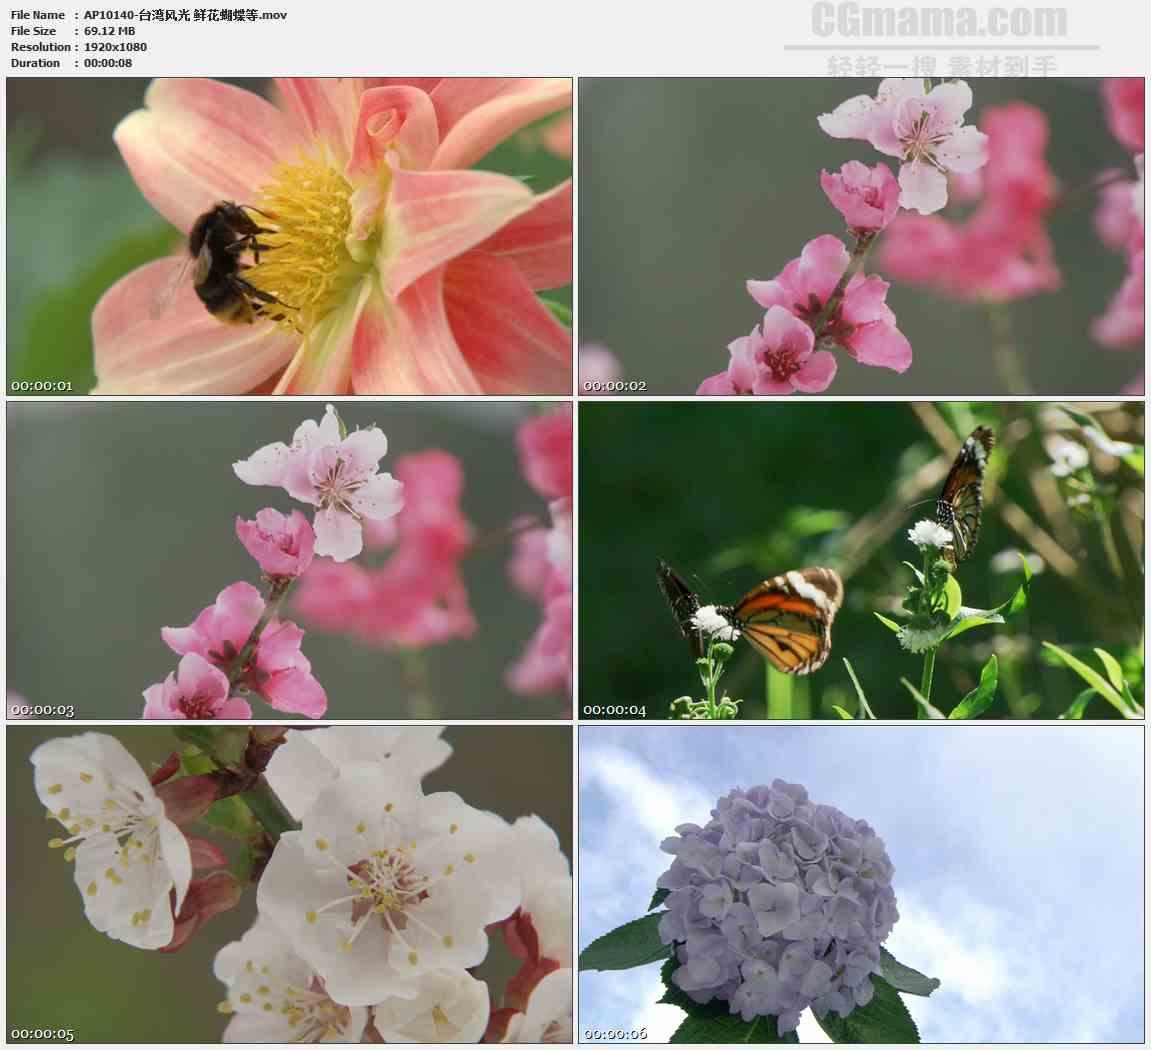 AP10140-花朵蝴蝶蜜蜂采蜜绣球花高清实拍视频素材